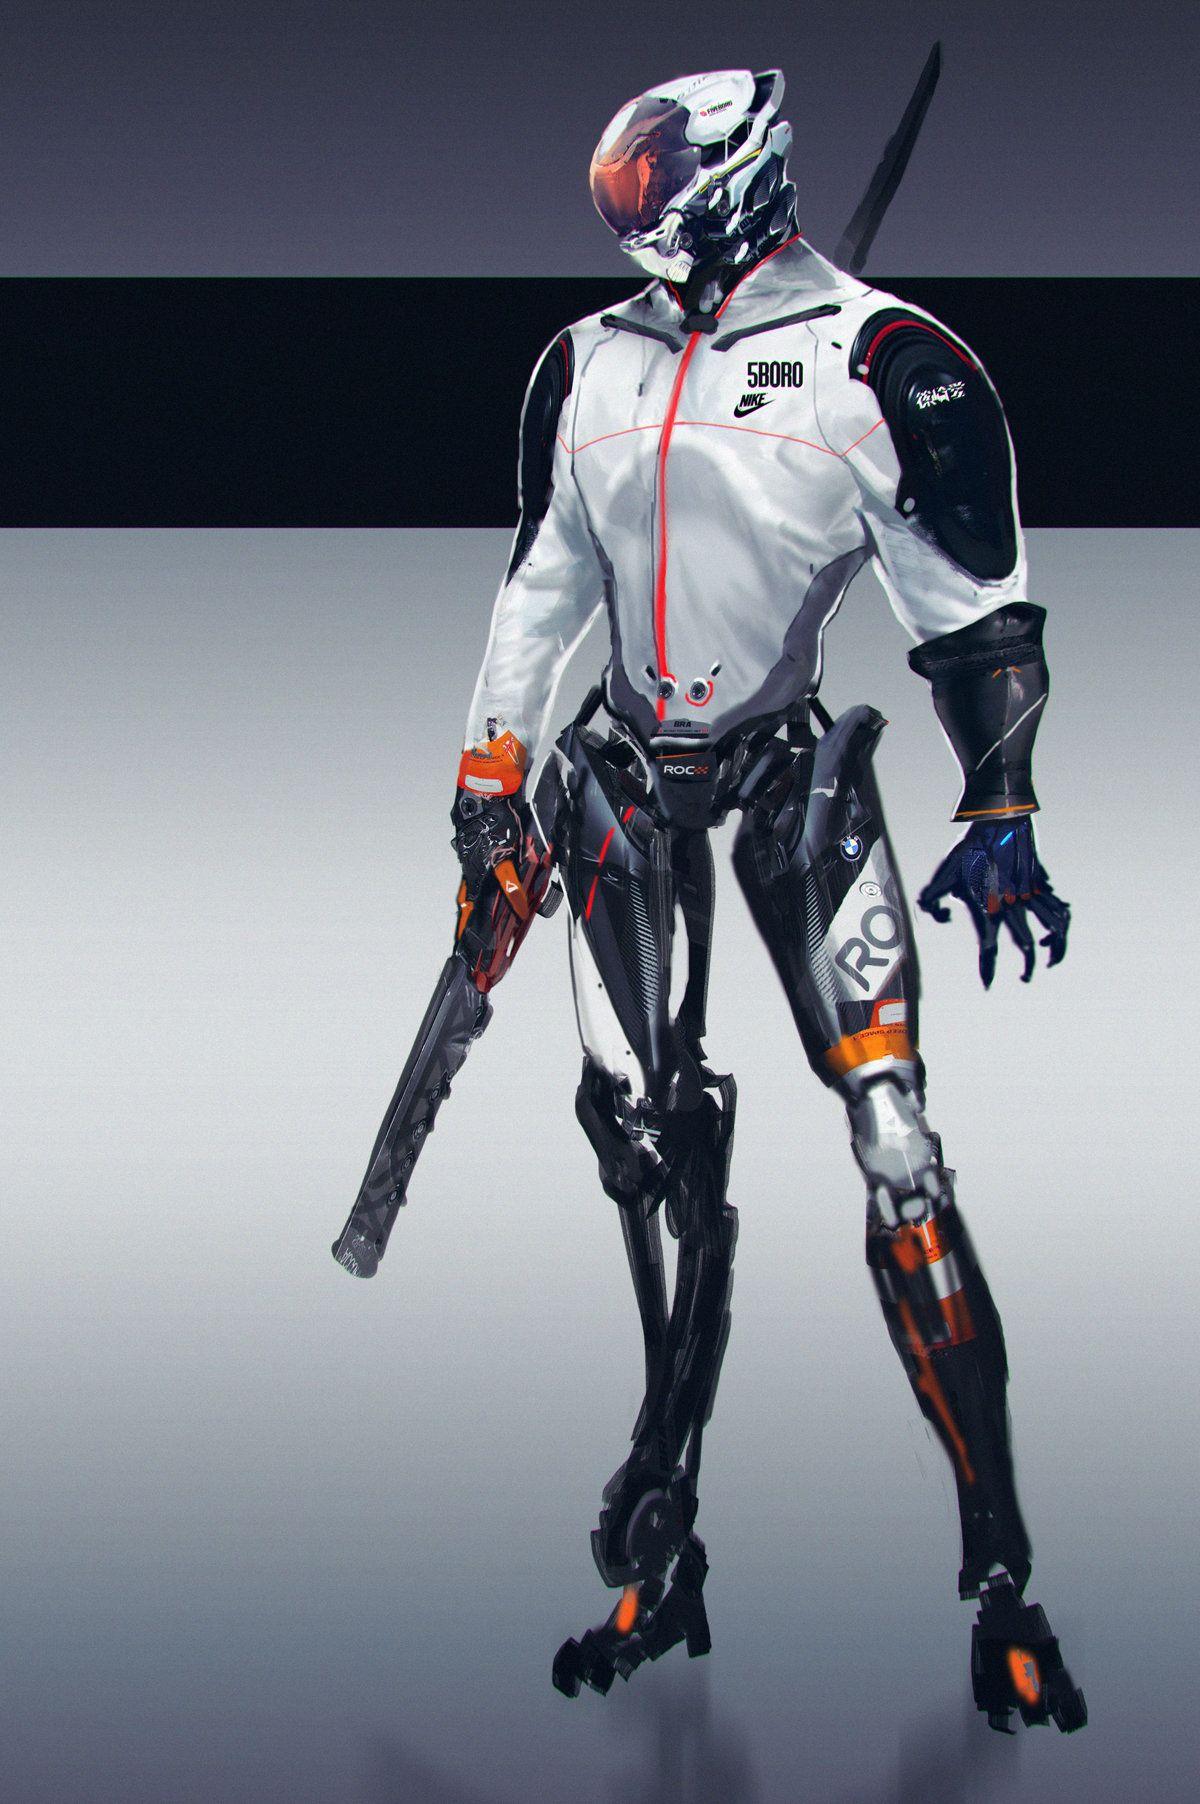 Here Cool Robots Robot Sci Fi And Cyberpunk